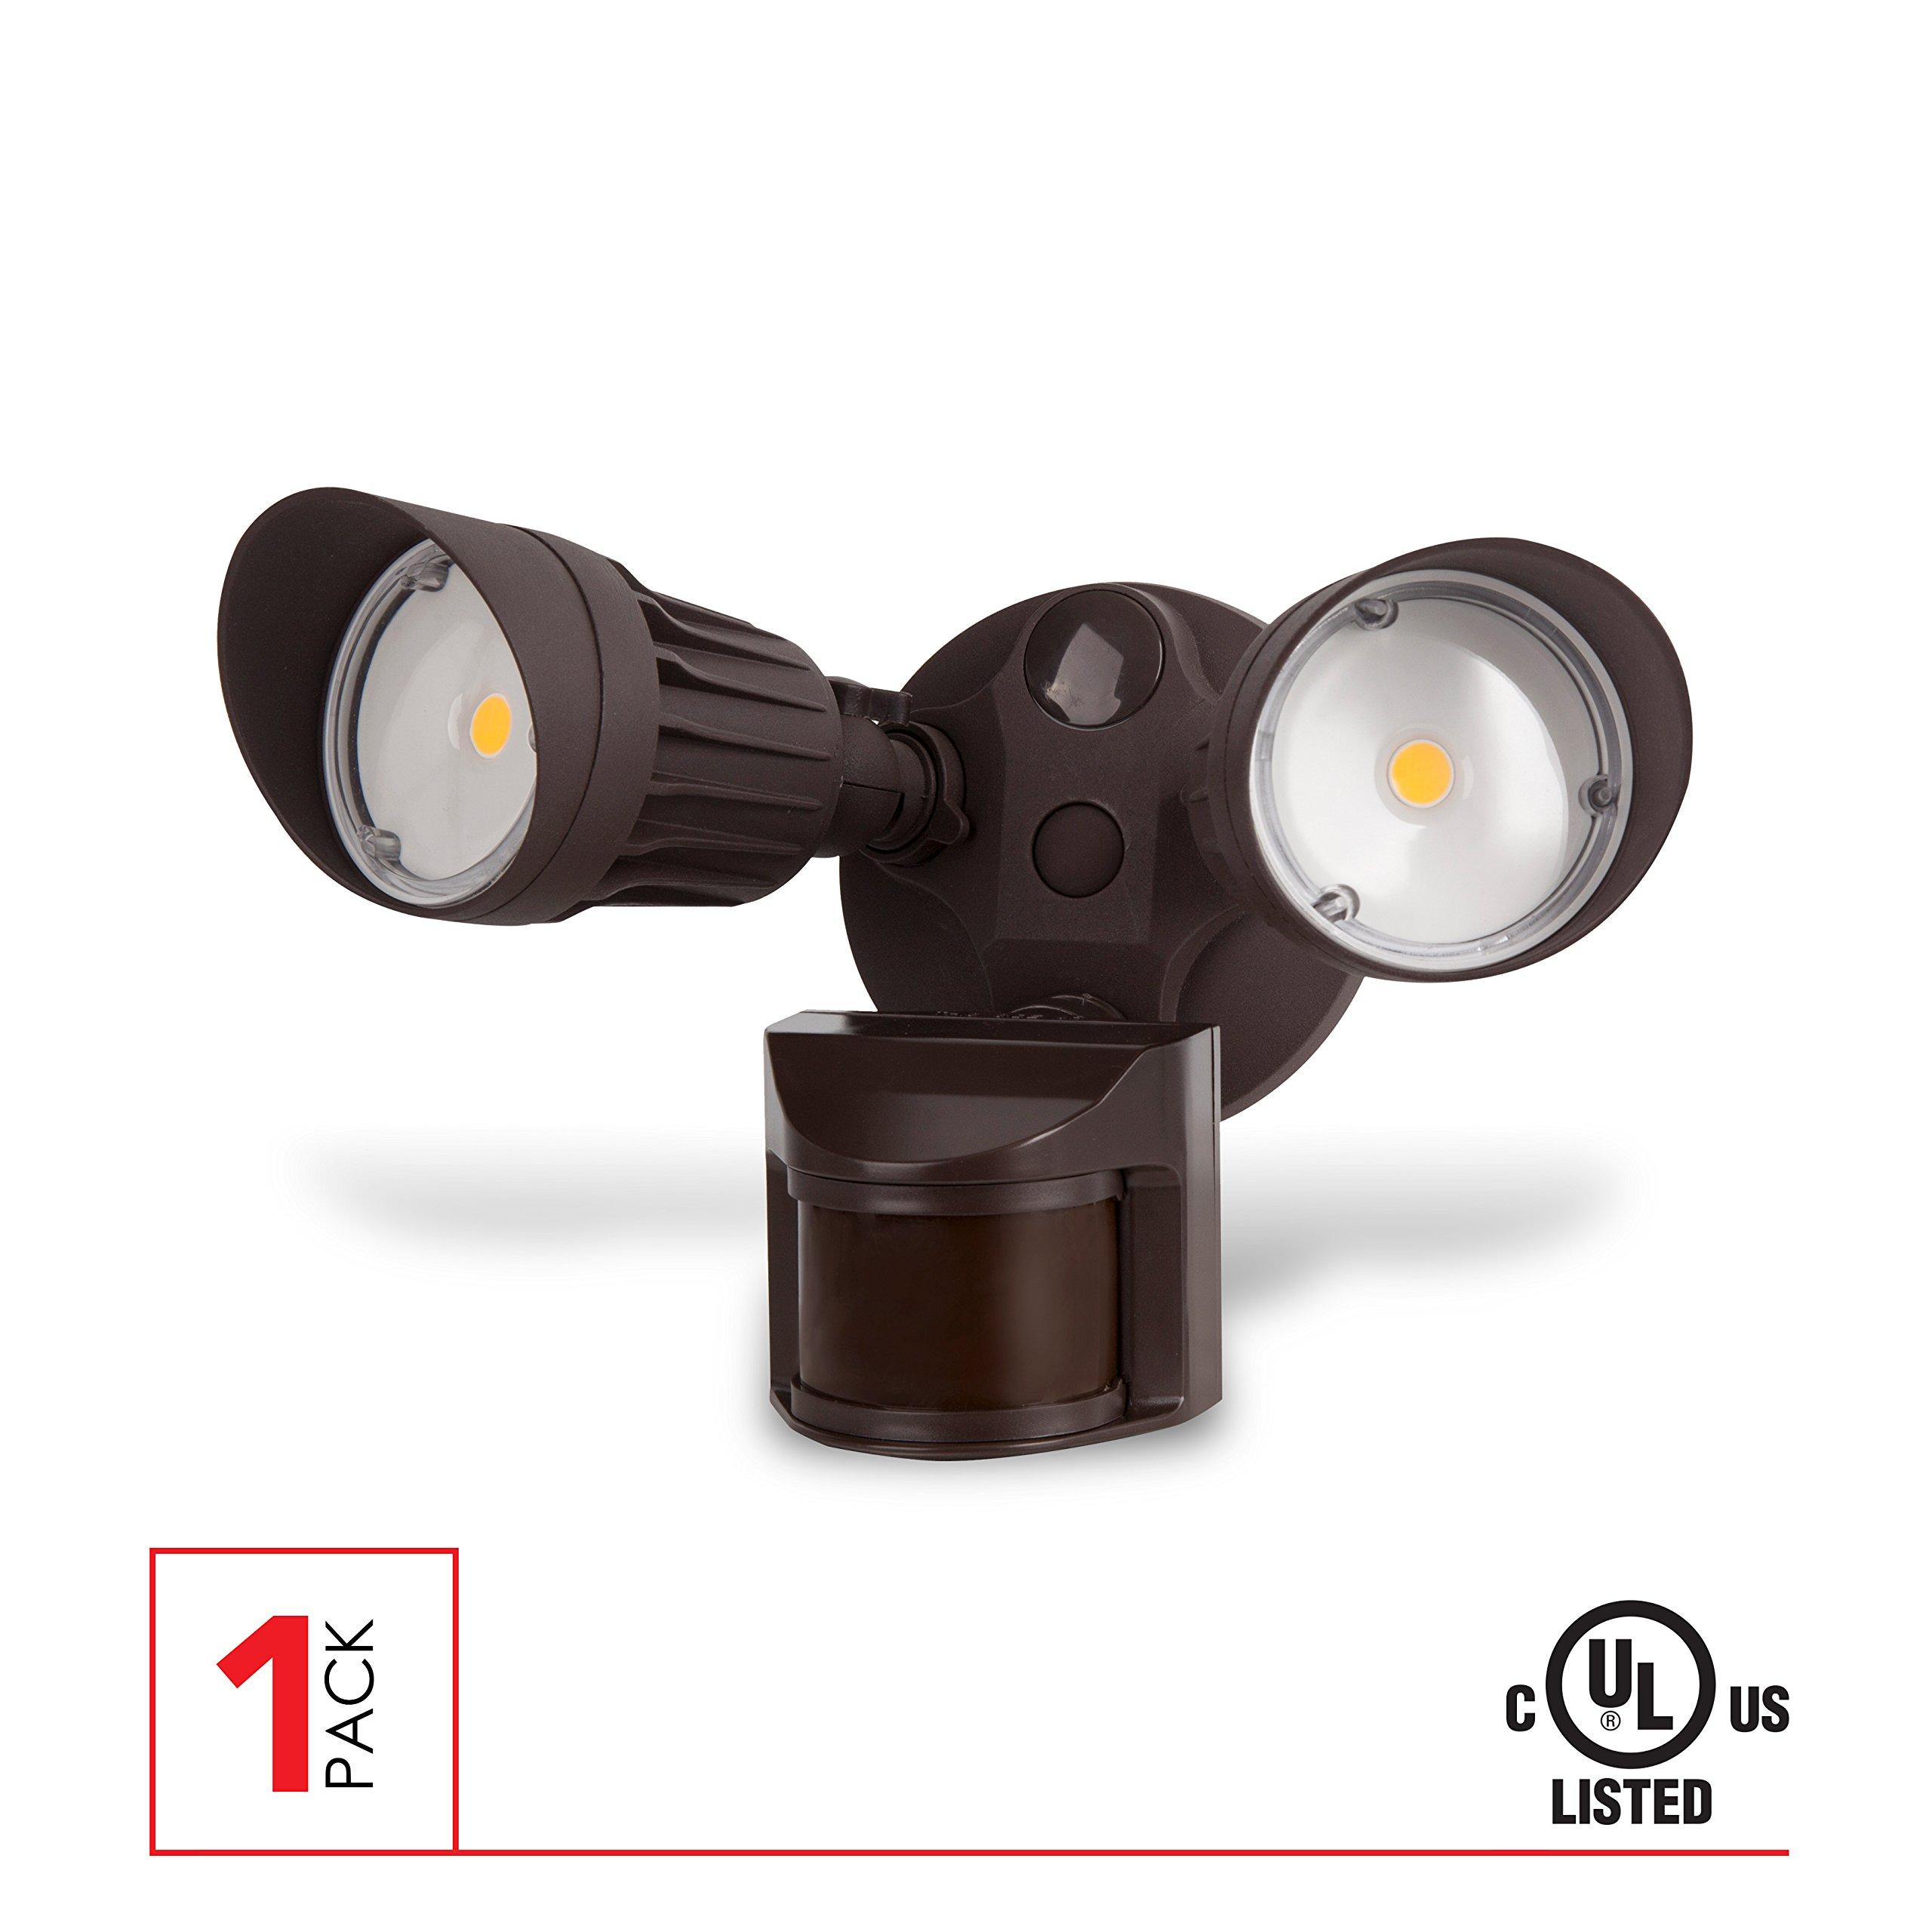 LED Security Light, 20W (100W Equivalent) Moition Sensor Light, 1800 Lumens, 5000K, Waterproof IP65, UL Listed, Bronze